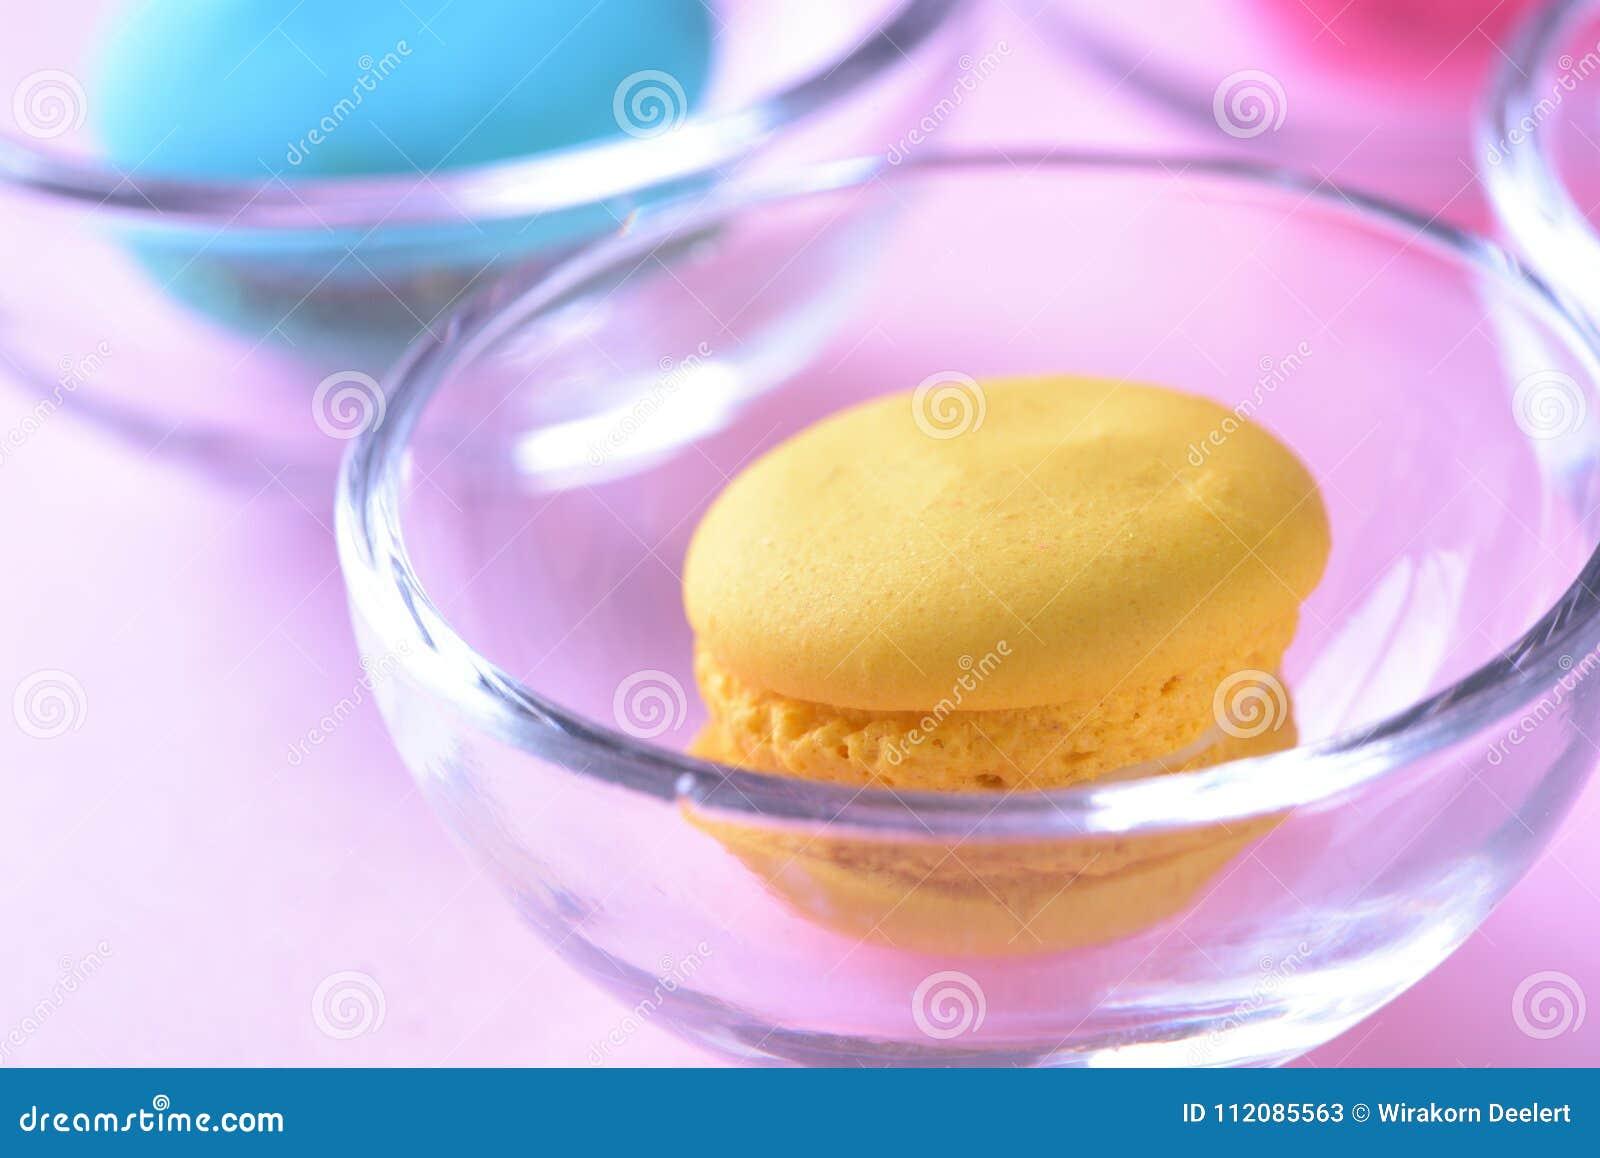 Macarons o macarrones coloridos en el beauti de cristal del dulce del postre de la taza